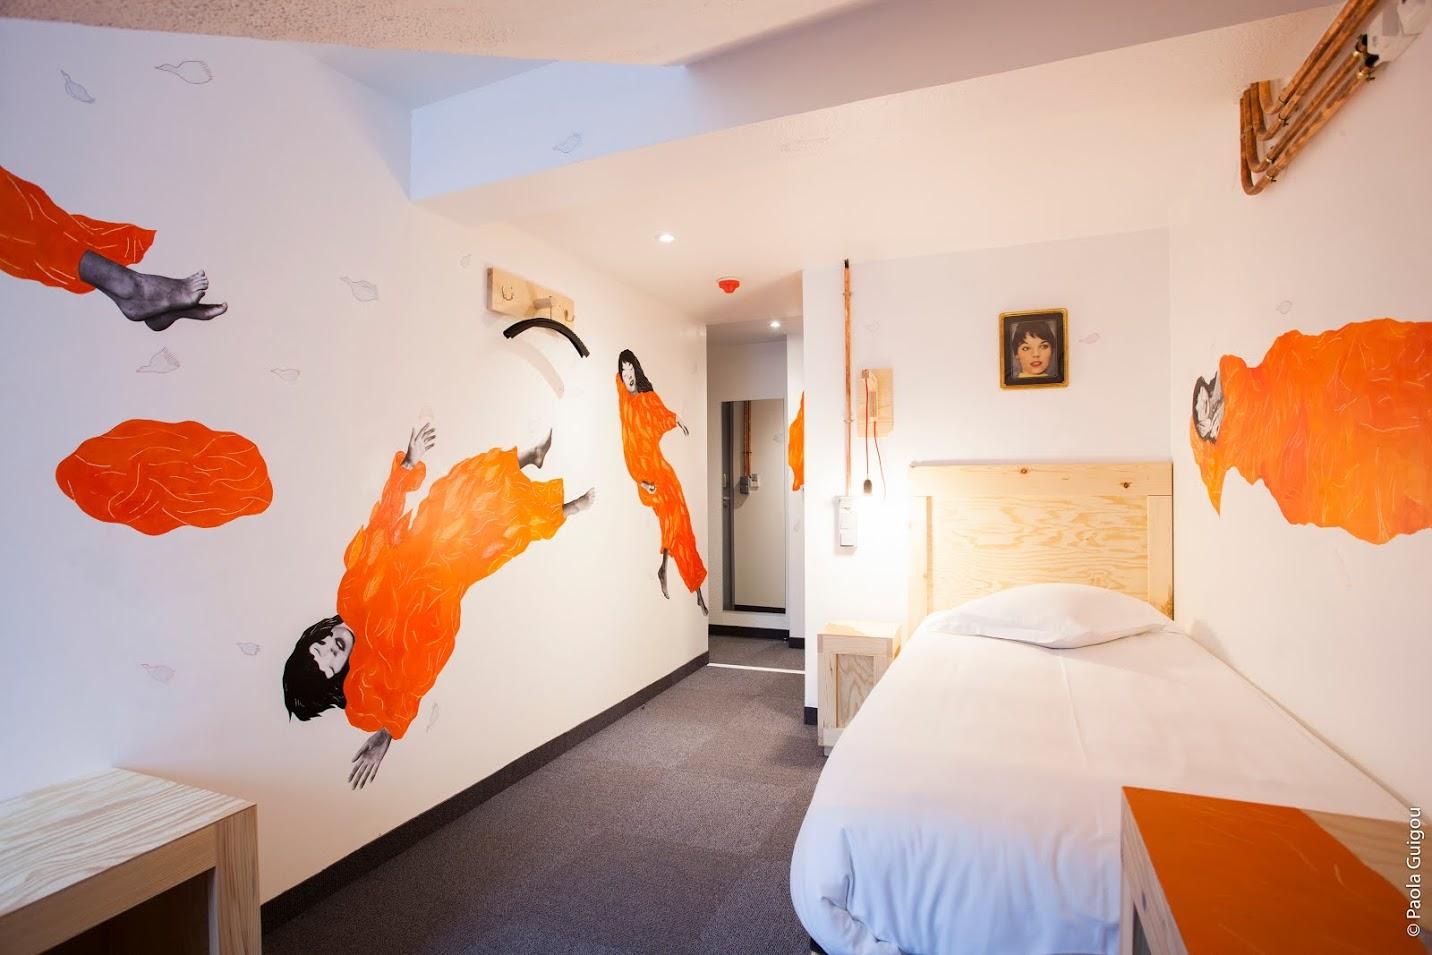 Room 405 by SHERLEY - (c) Paola Guigou - Graffalgar - 243